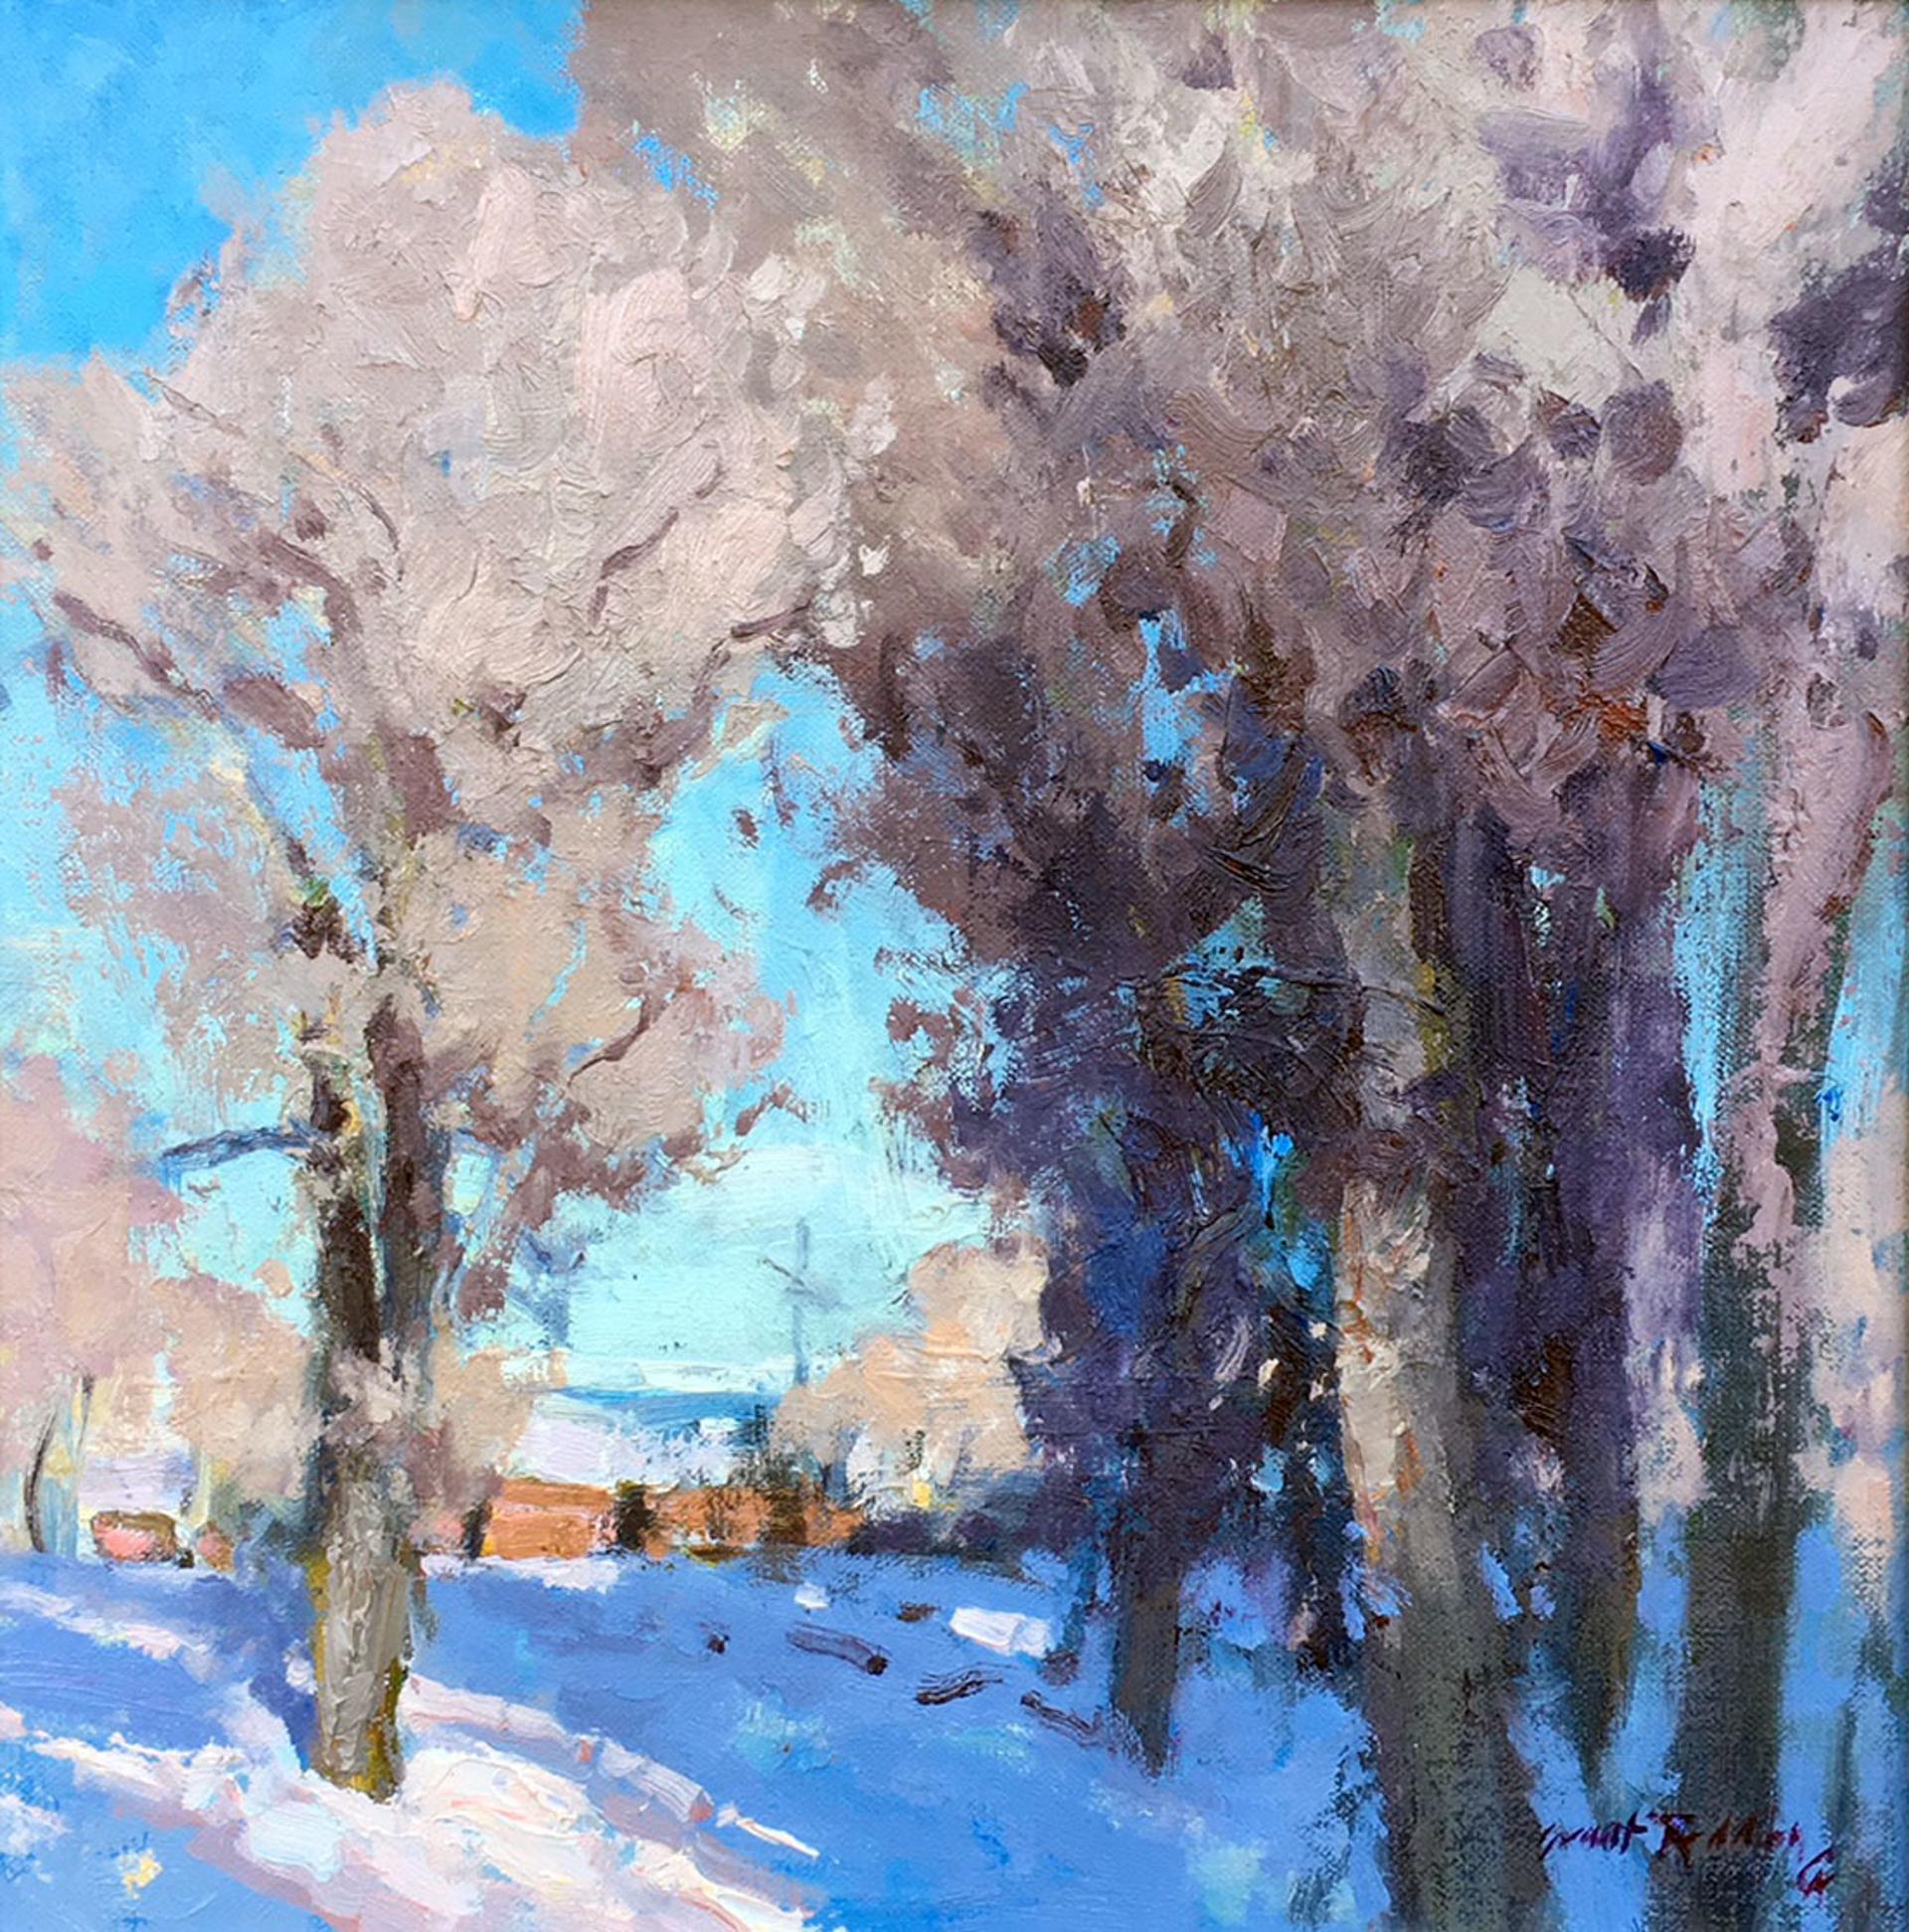 Winter Cottonwoods by Grant Redden